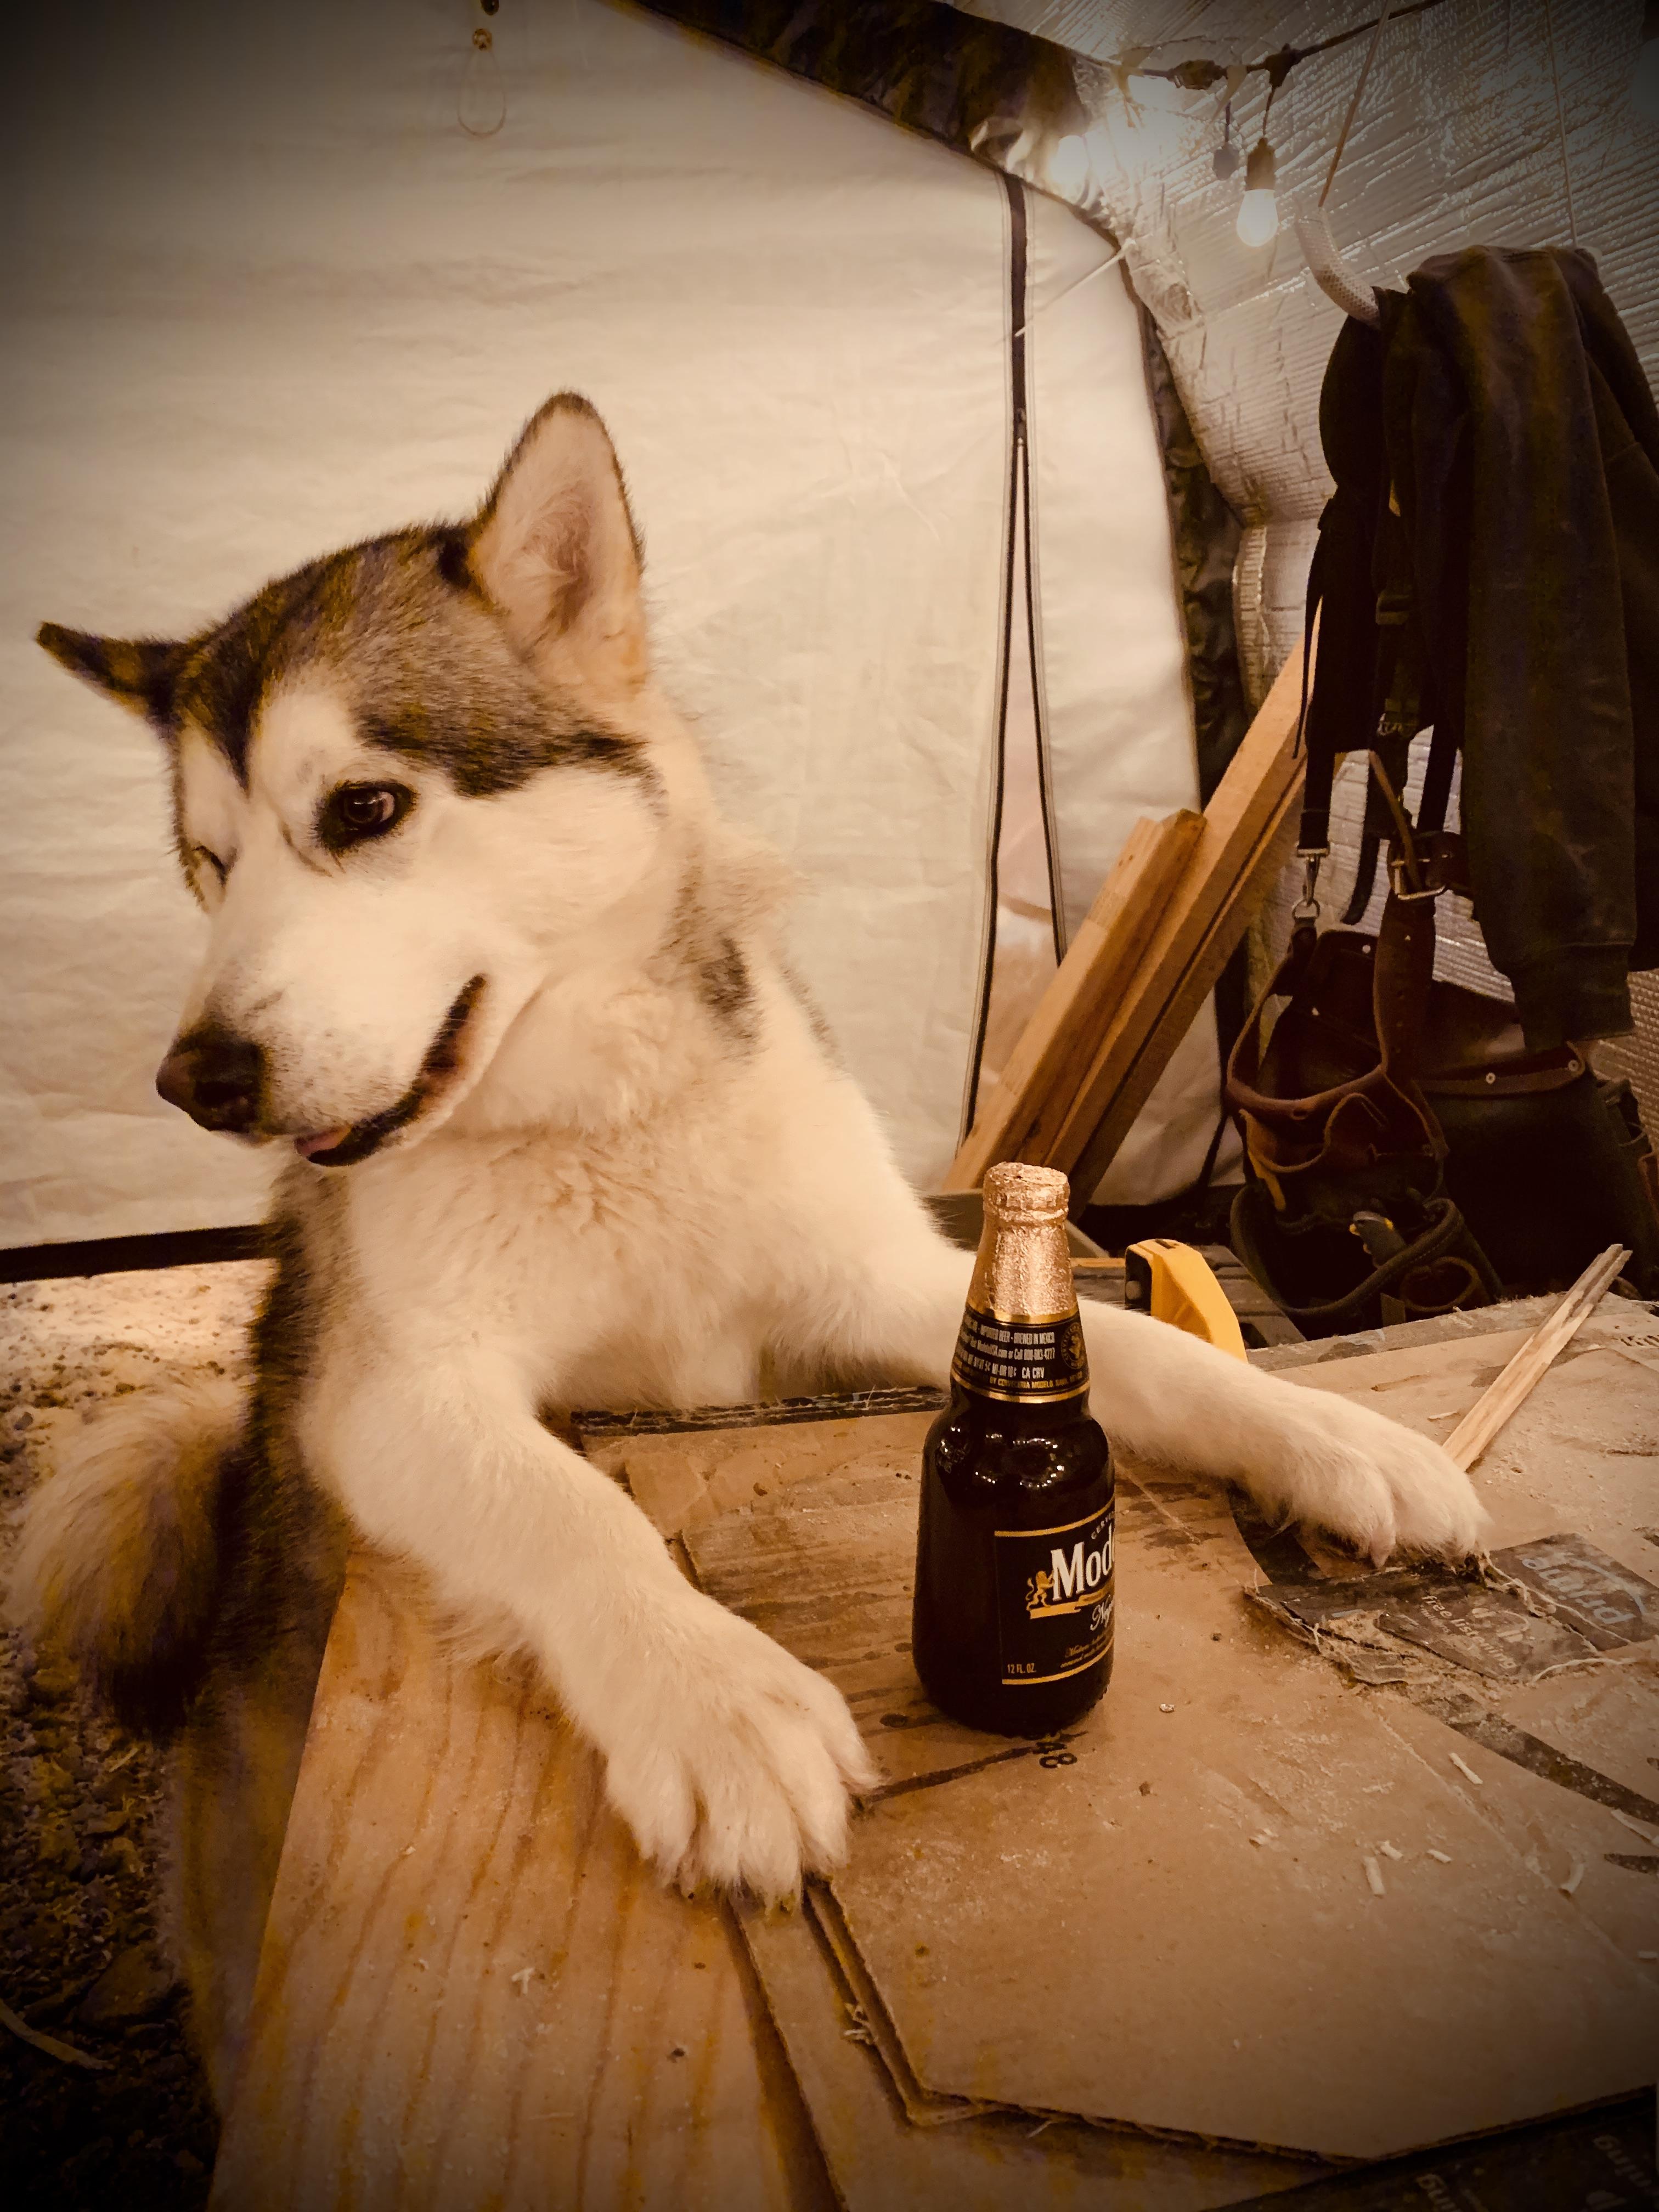 Beneath the Borealis Post Cabin Fever 02:24:20 Alaskan Malamute Modelo